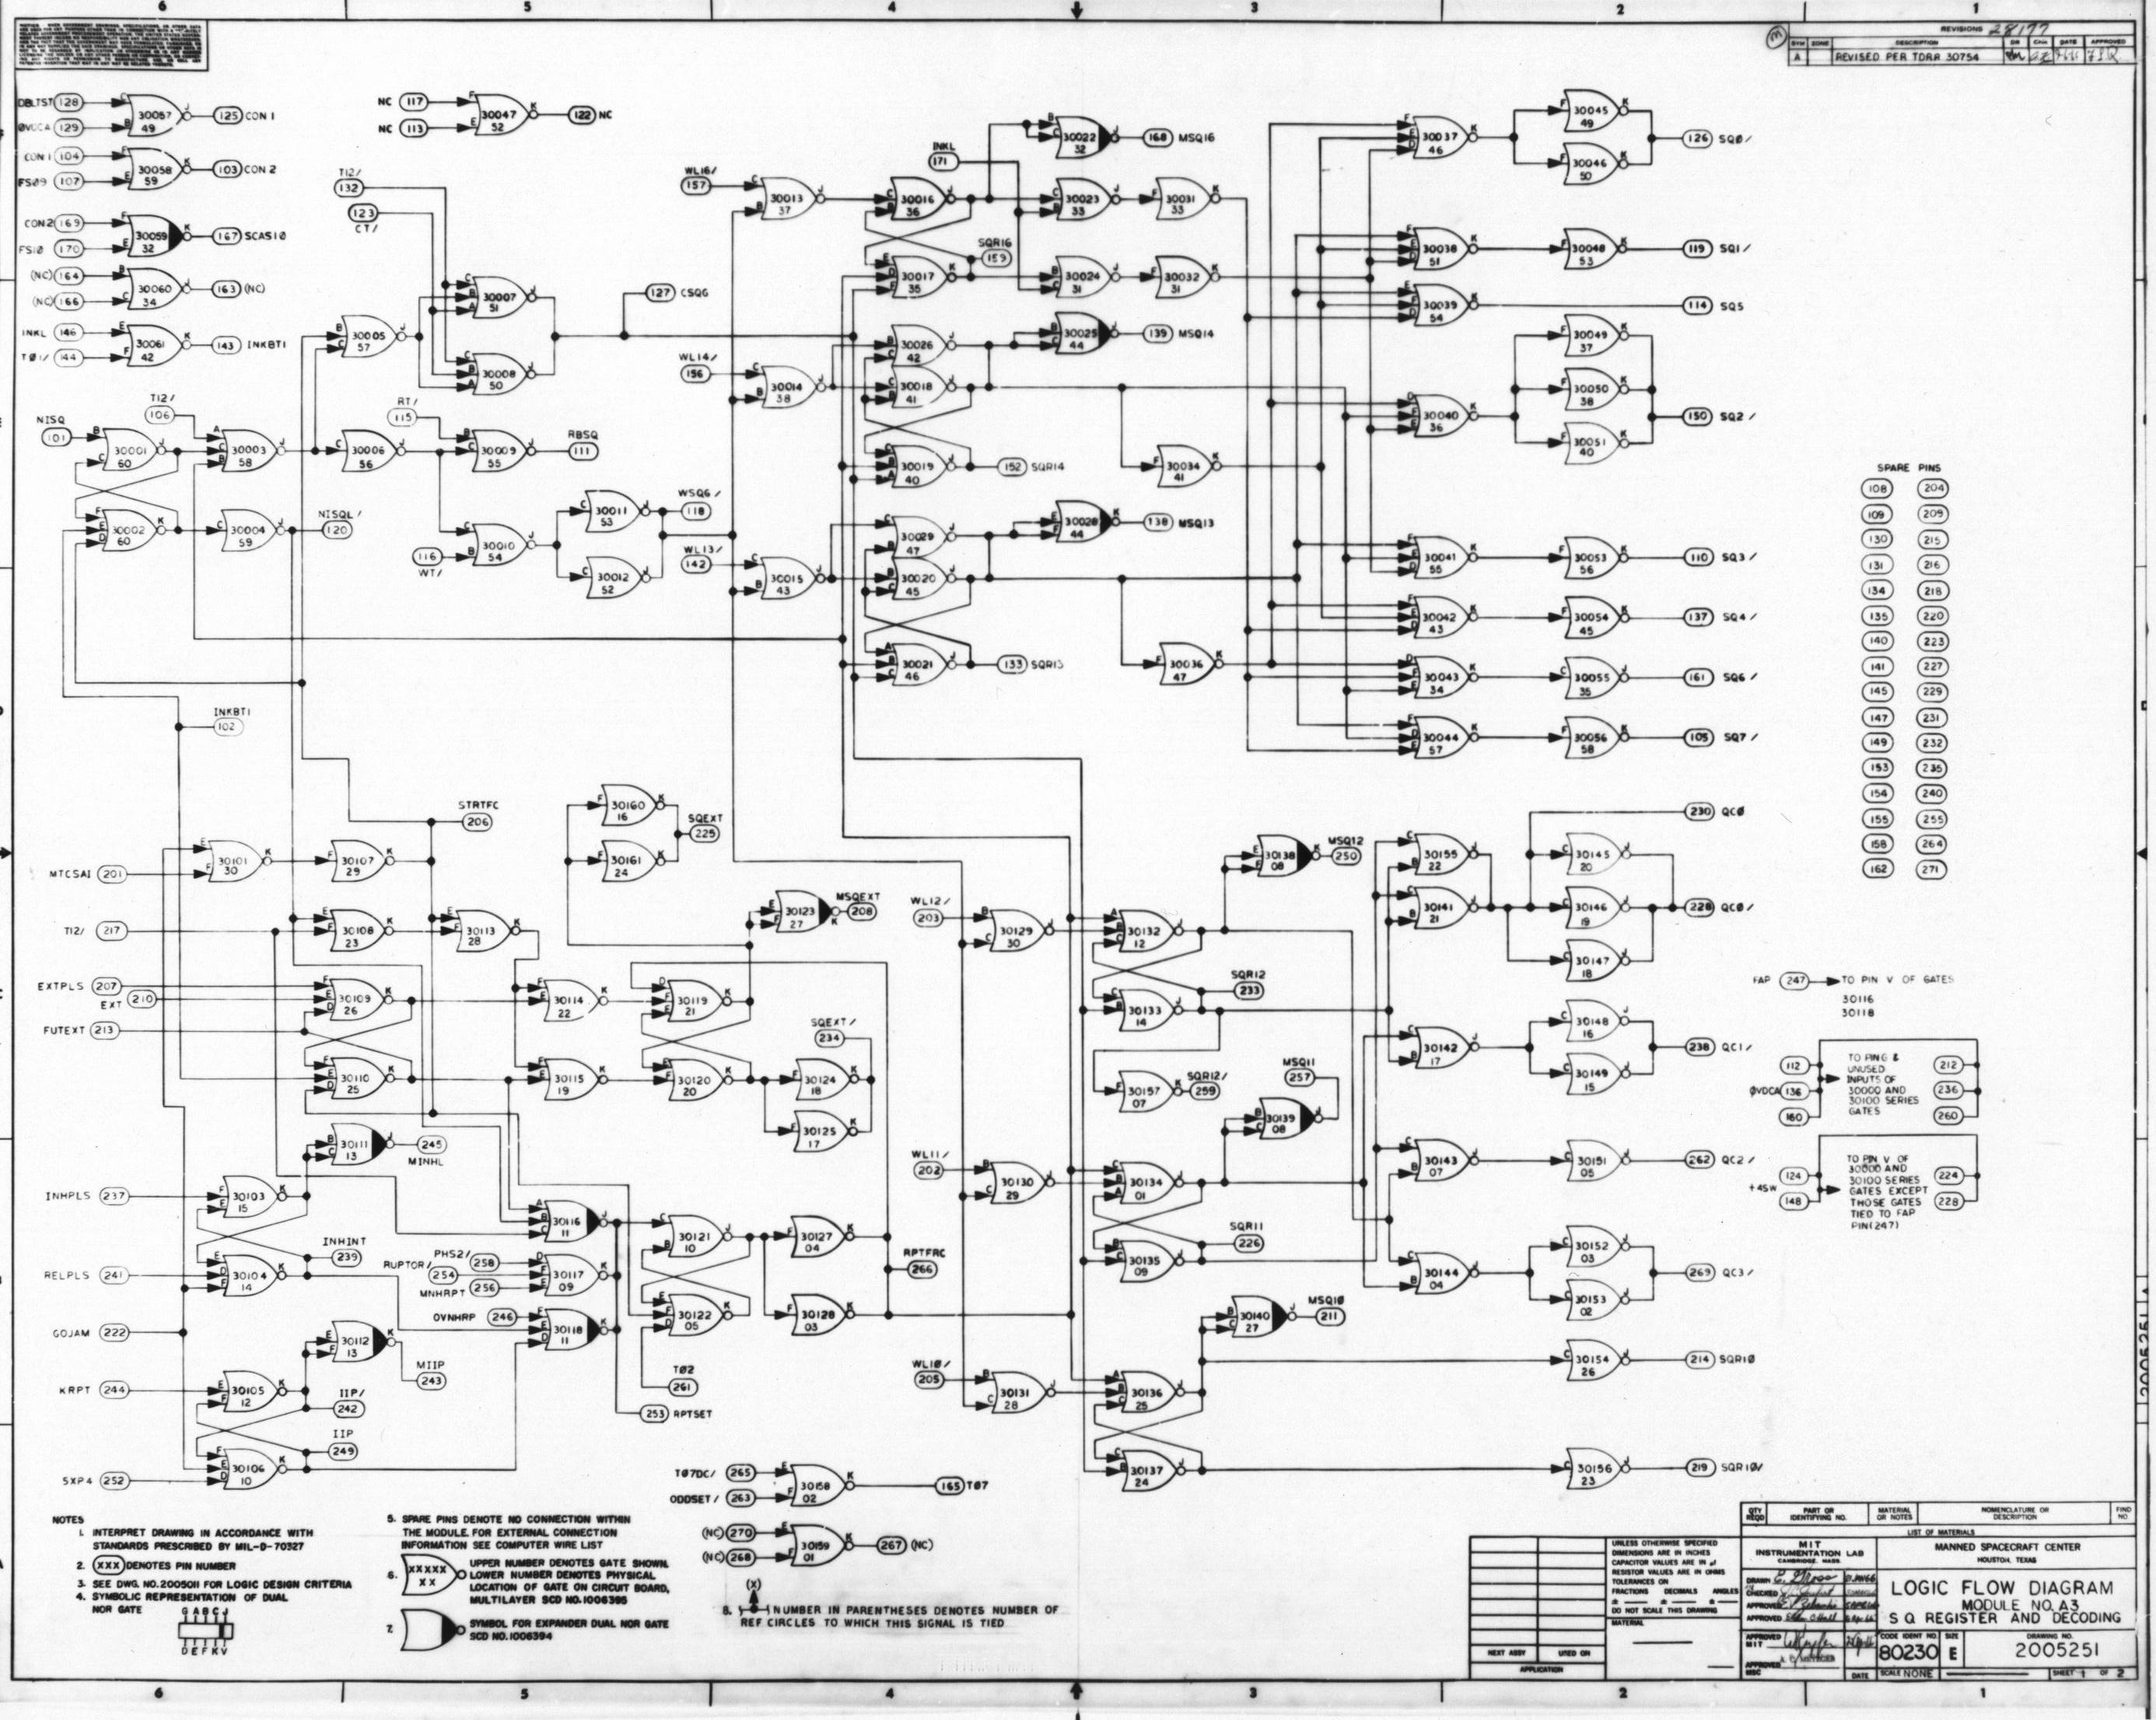 Apollo Guidance Computer Agc Schematics